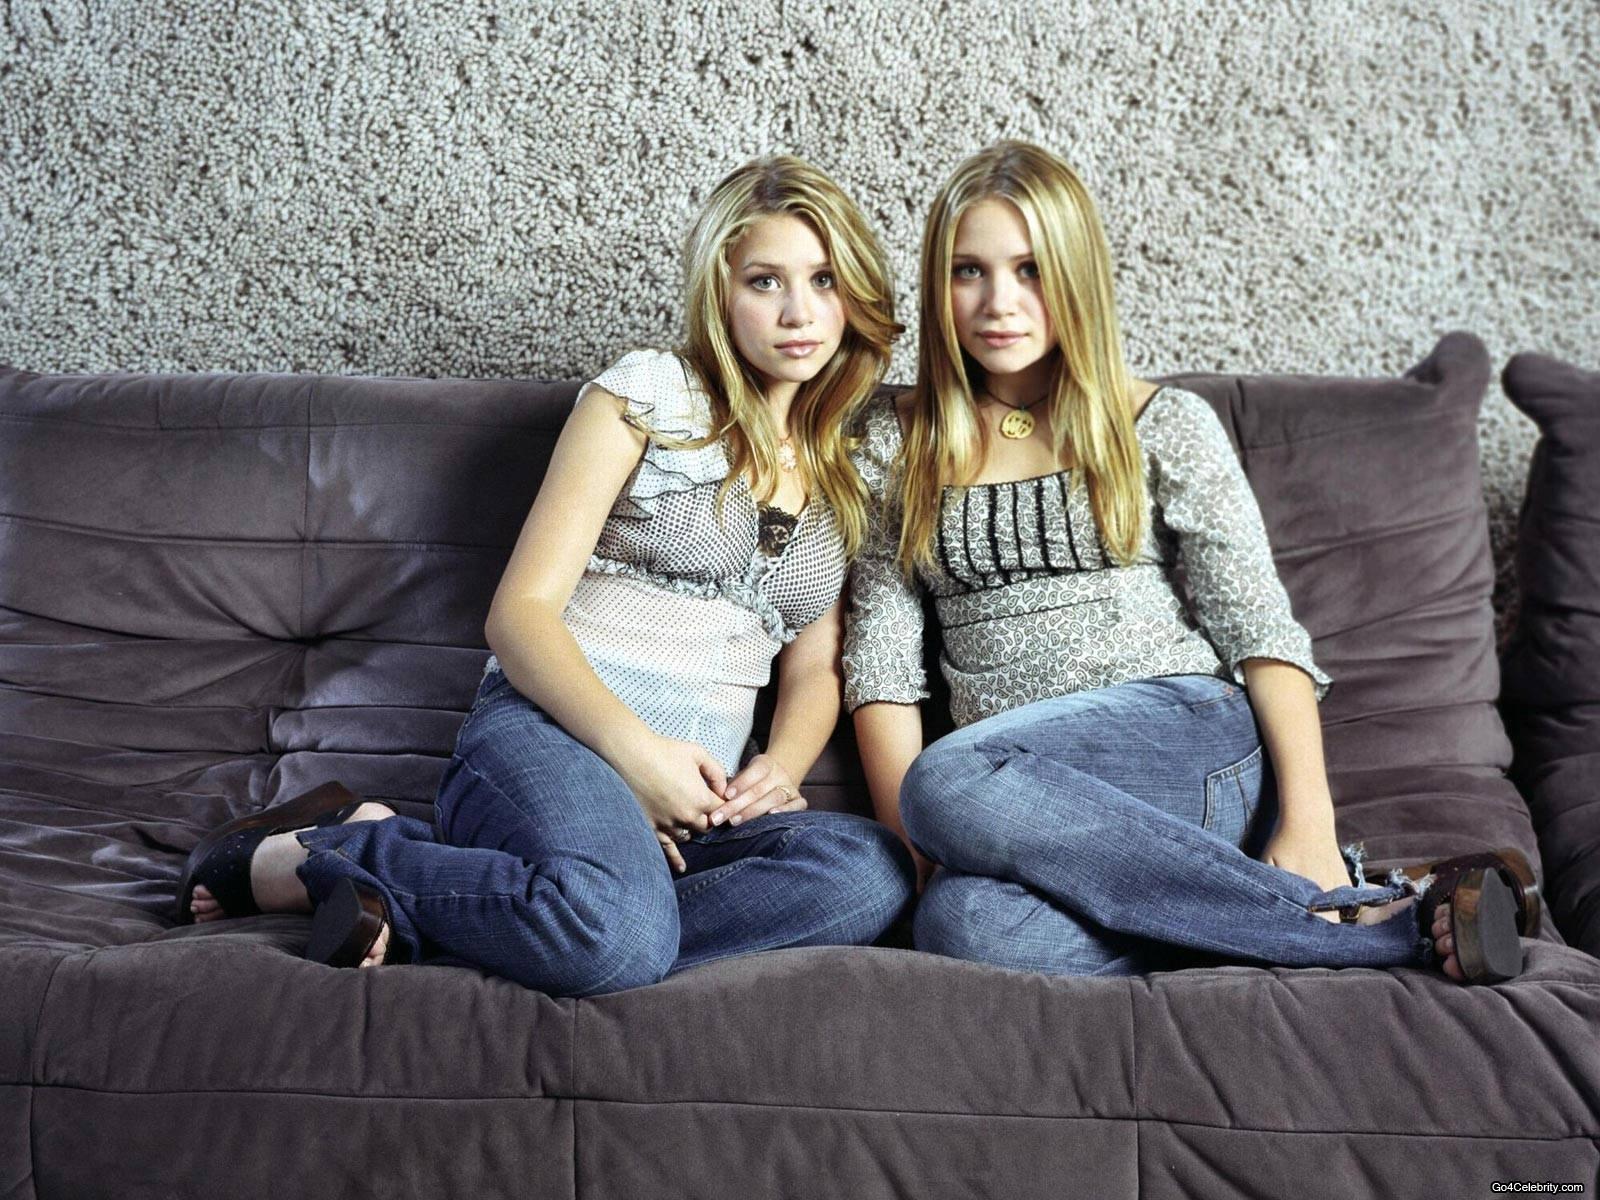 Olsen Twins Wallpapers 1600x1200